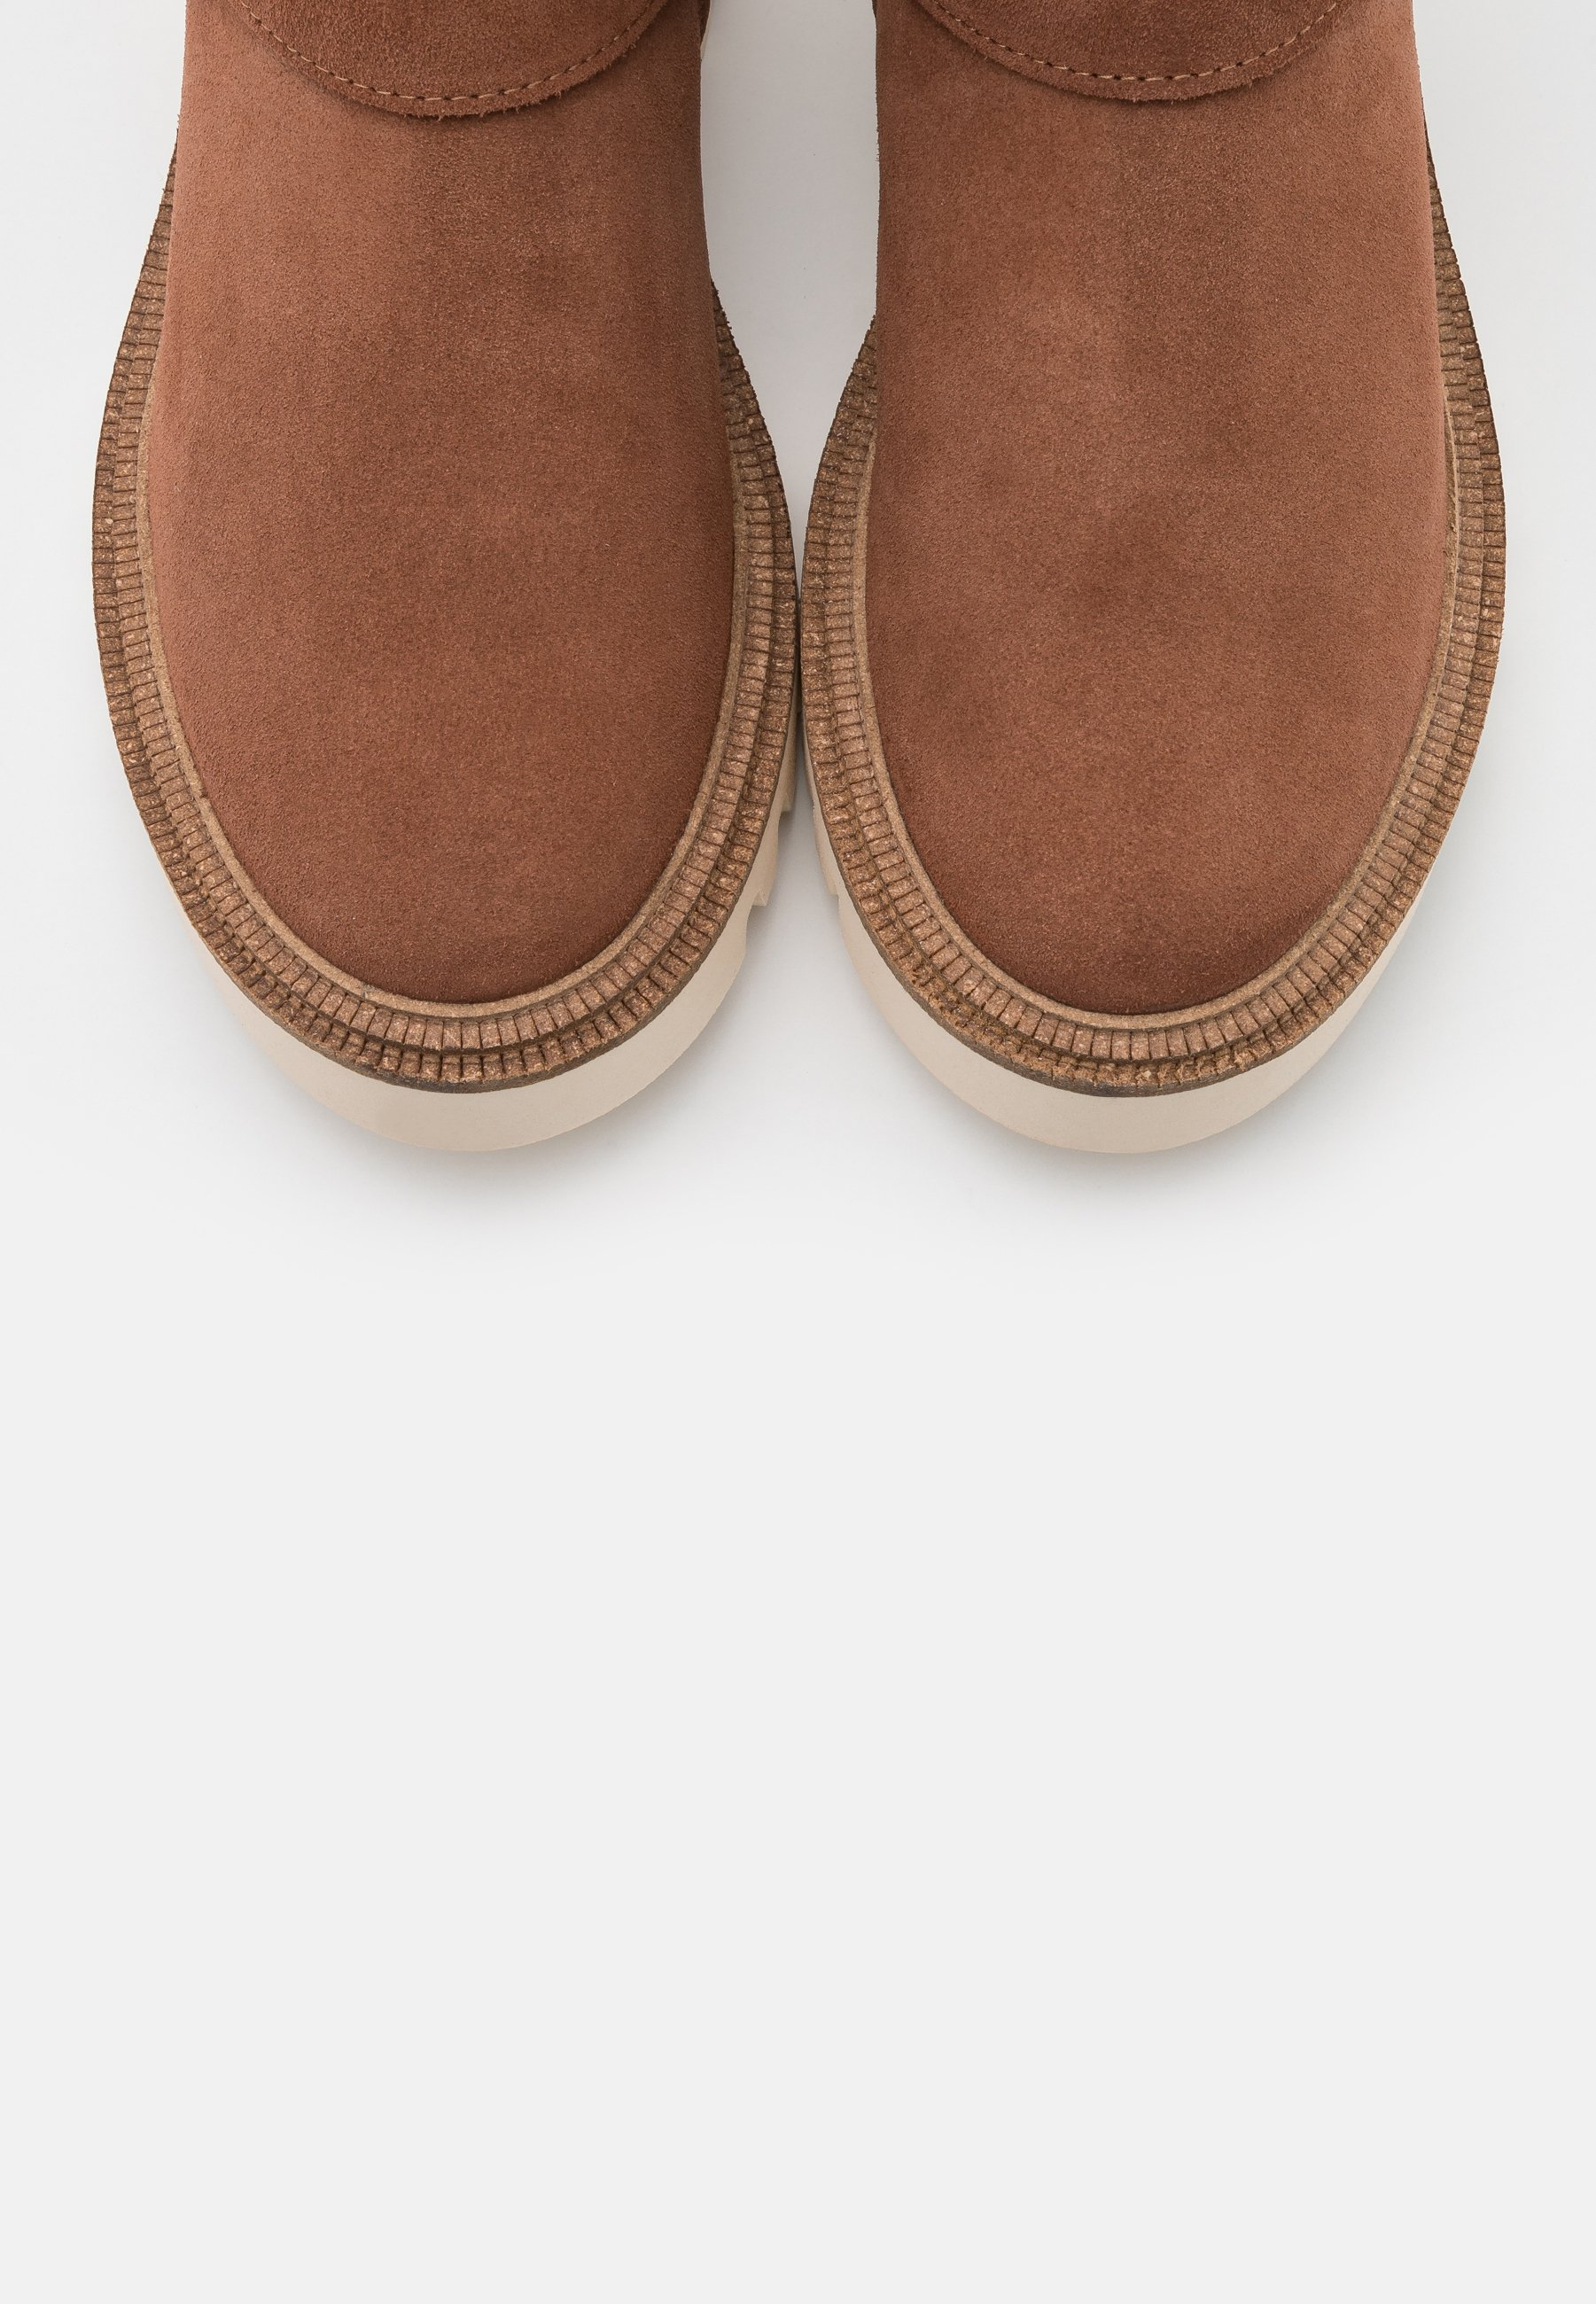 Tamaris Boots - Støvletter Cognac/konjakk